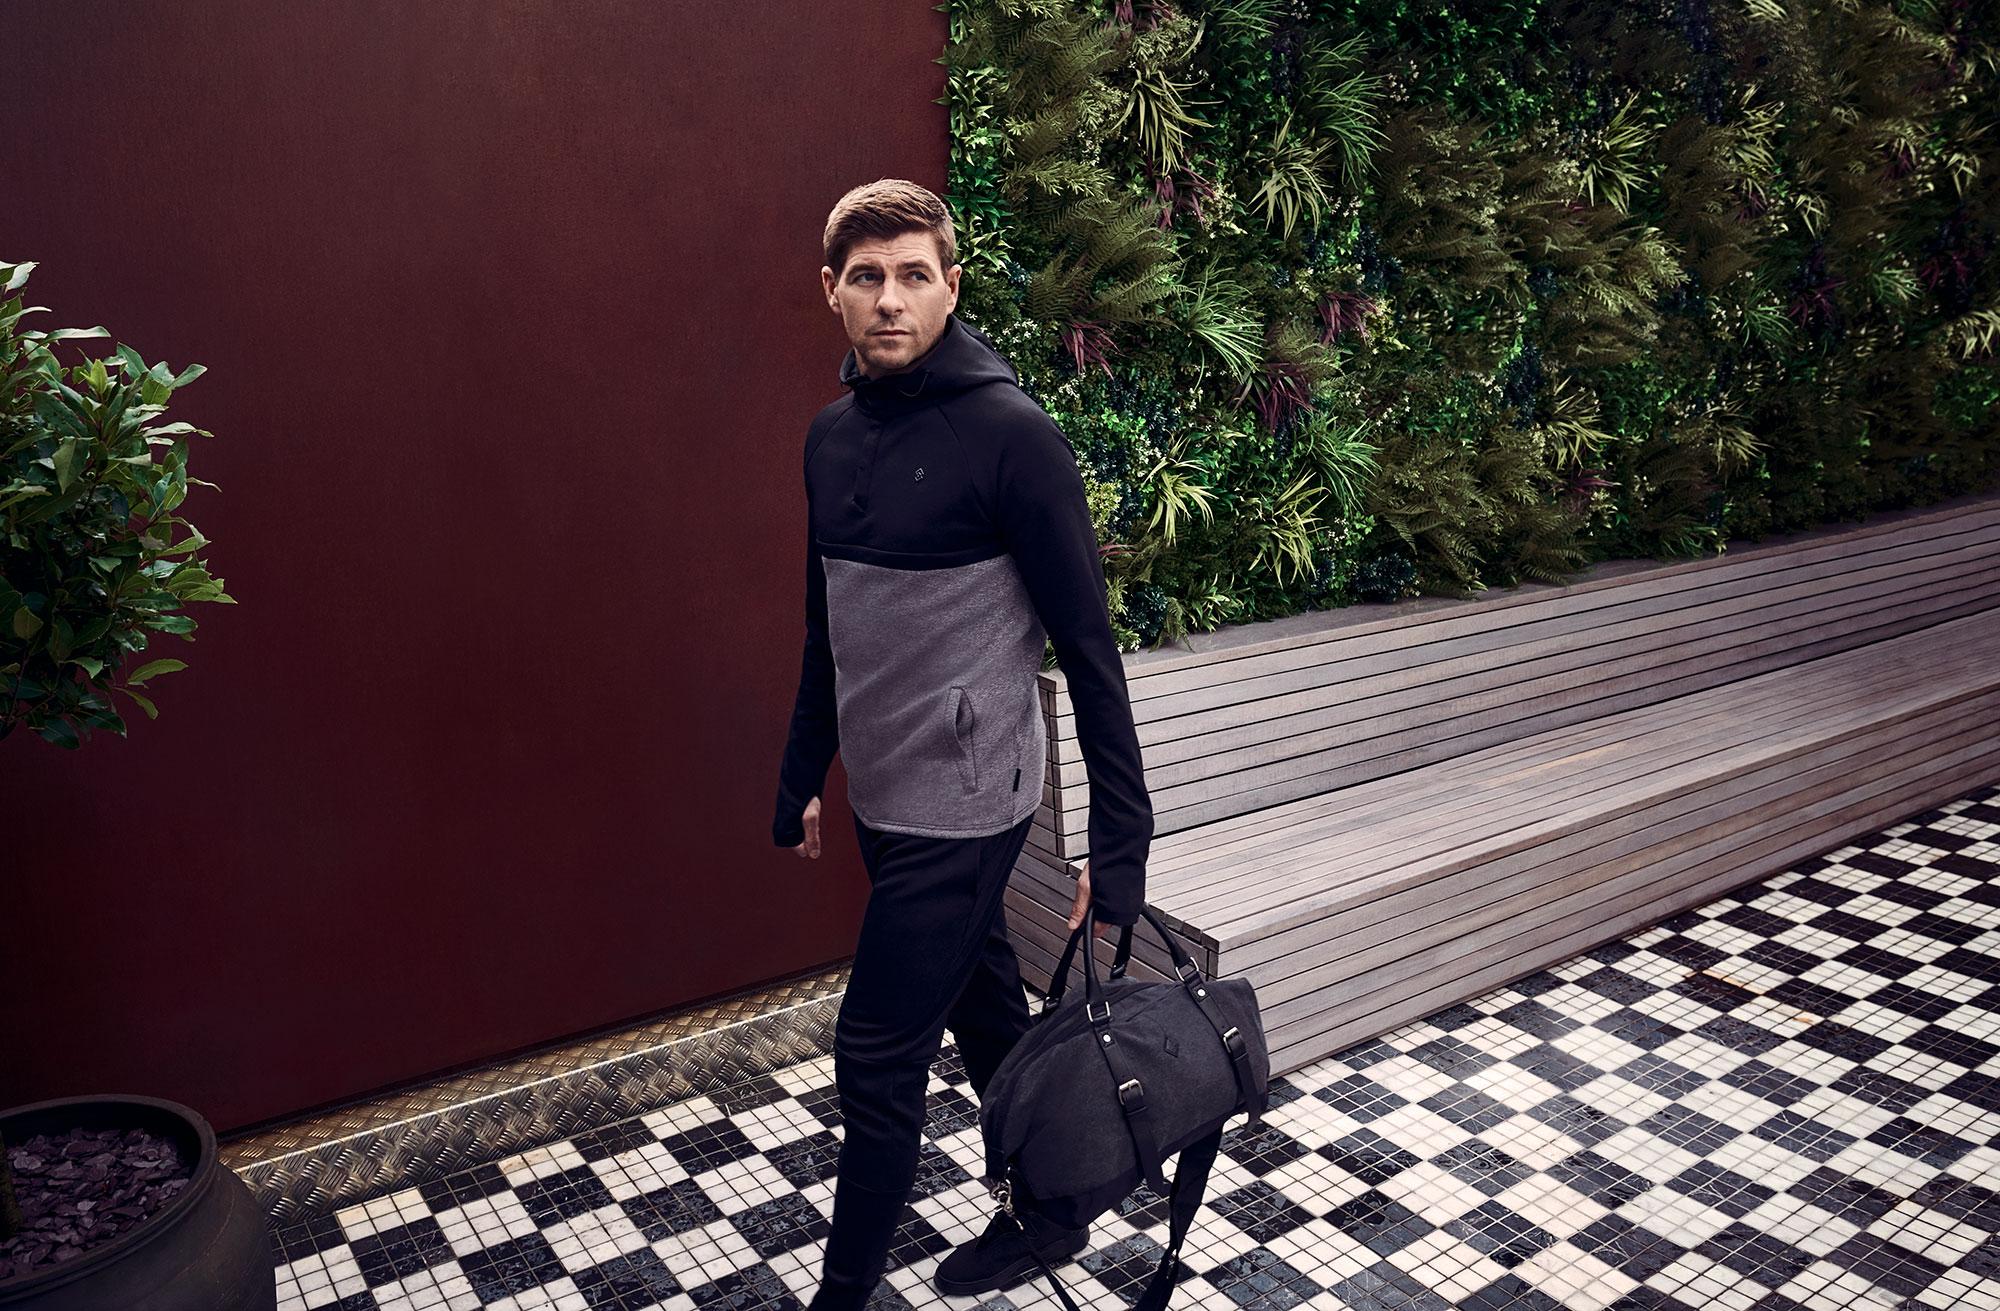 Steven-Gerrard-by-Sane-Seven-campaign-advert-portrait-walking-2000-px-wide